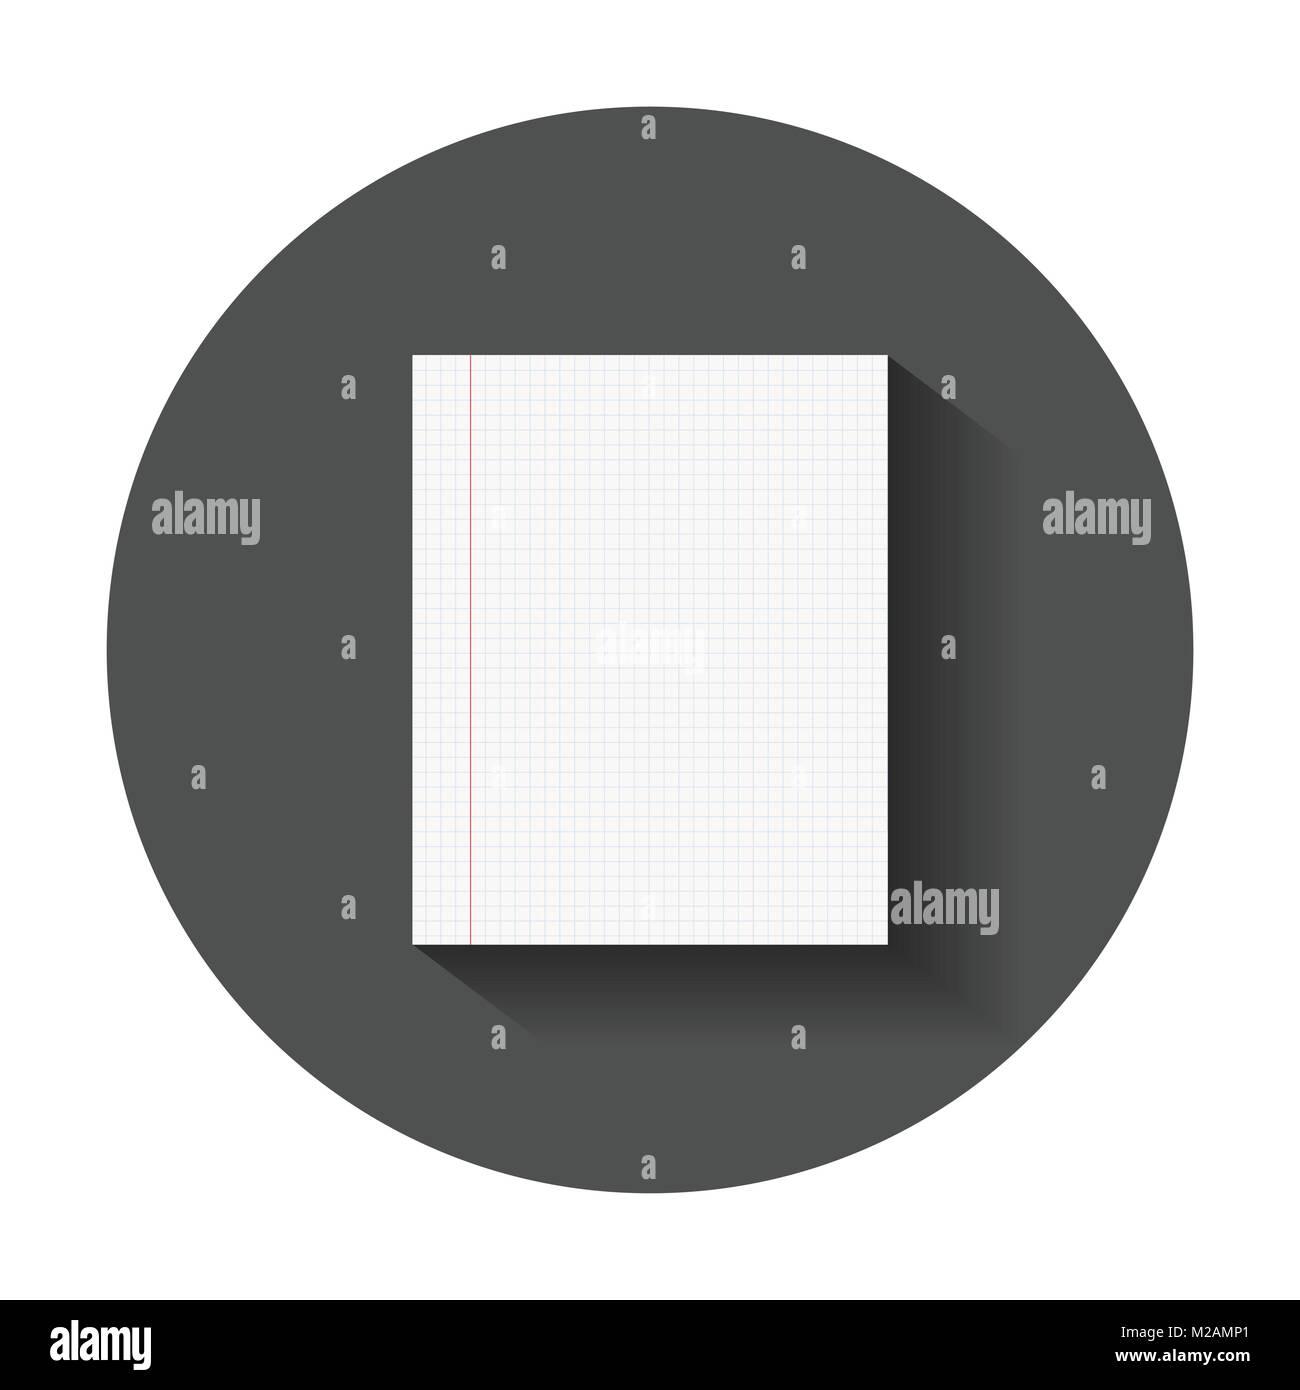 Wonderful grid paper template ideas professional resume example blueprint paper texture stock photos blueprint paper texture malvernweather Images